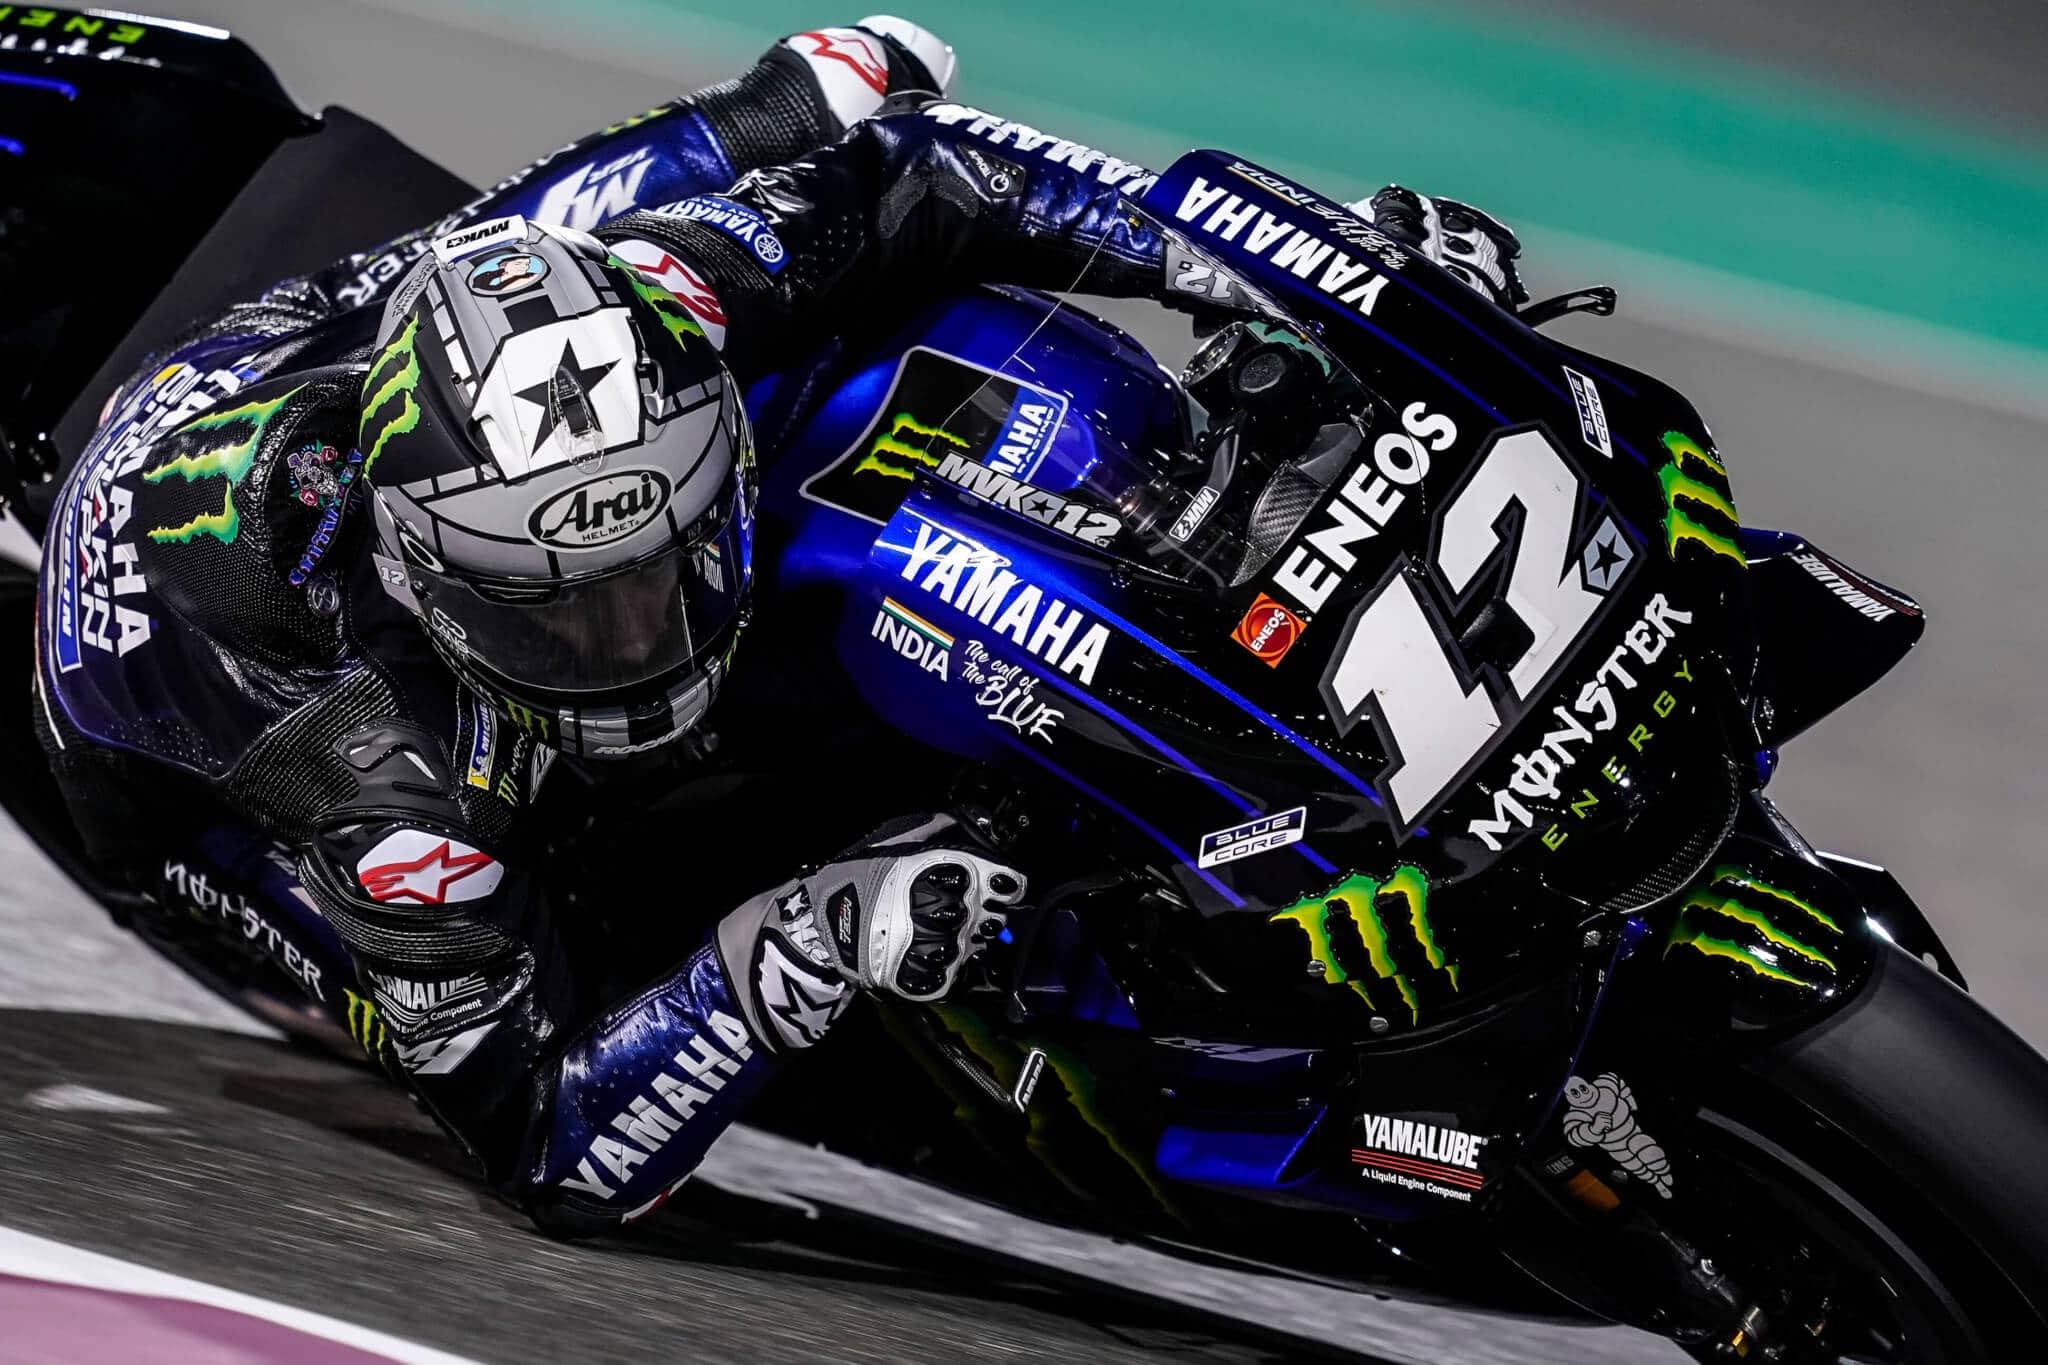 Maverick Vinñales Yamaha MotoGP Qatar 2019